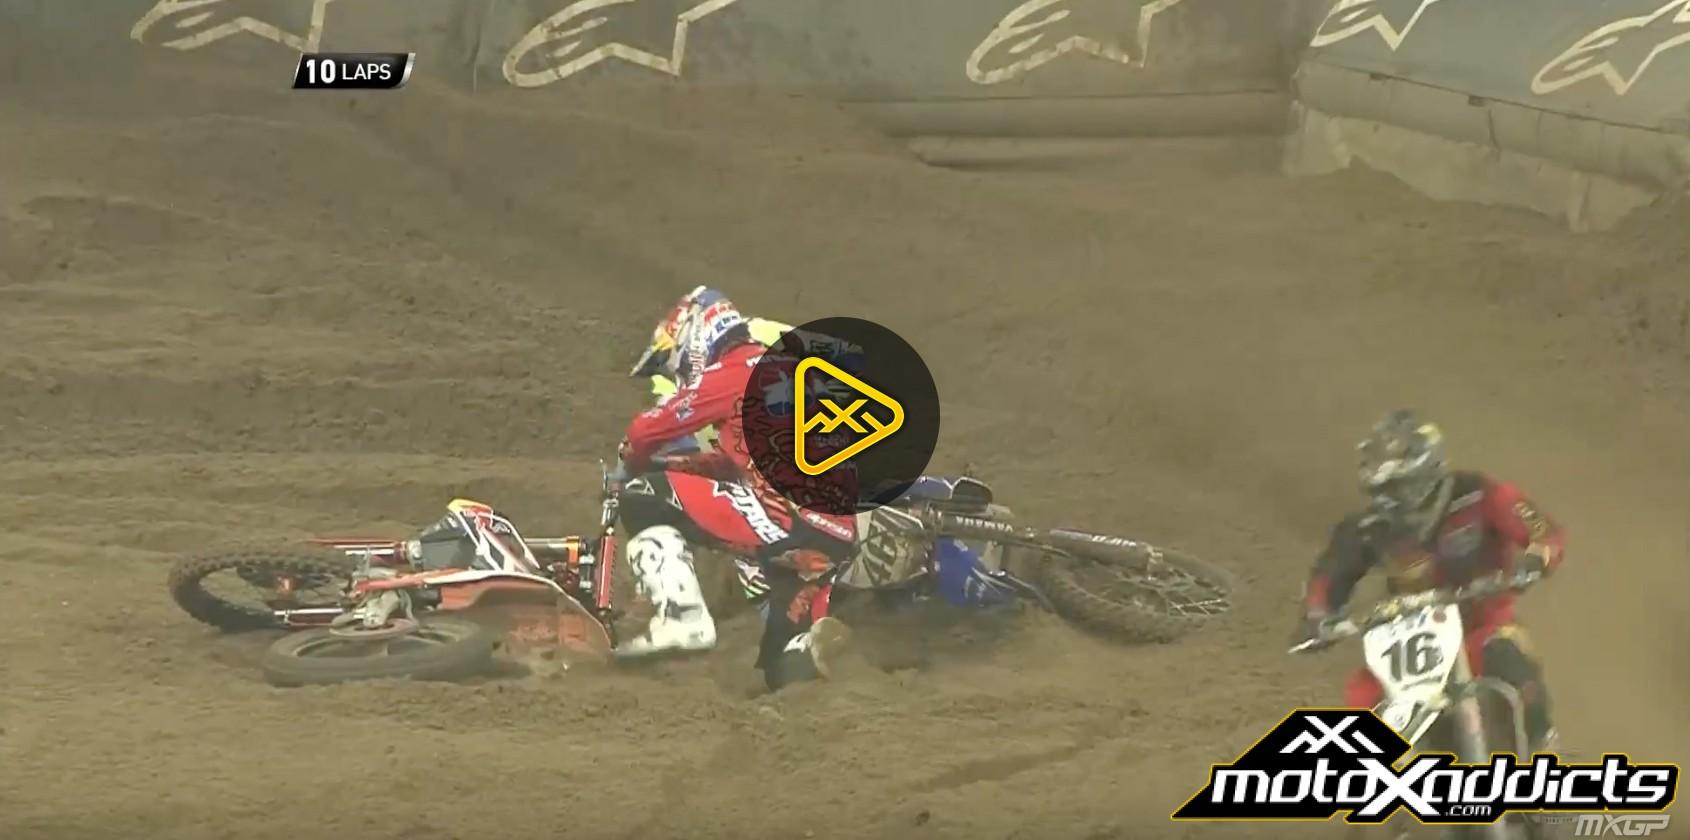 Jeffrey Herlings & Romain Febvre Crash – 2016 SMX Riders Cup